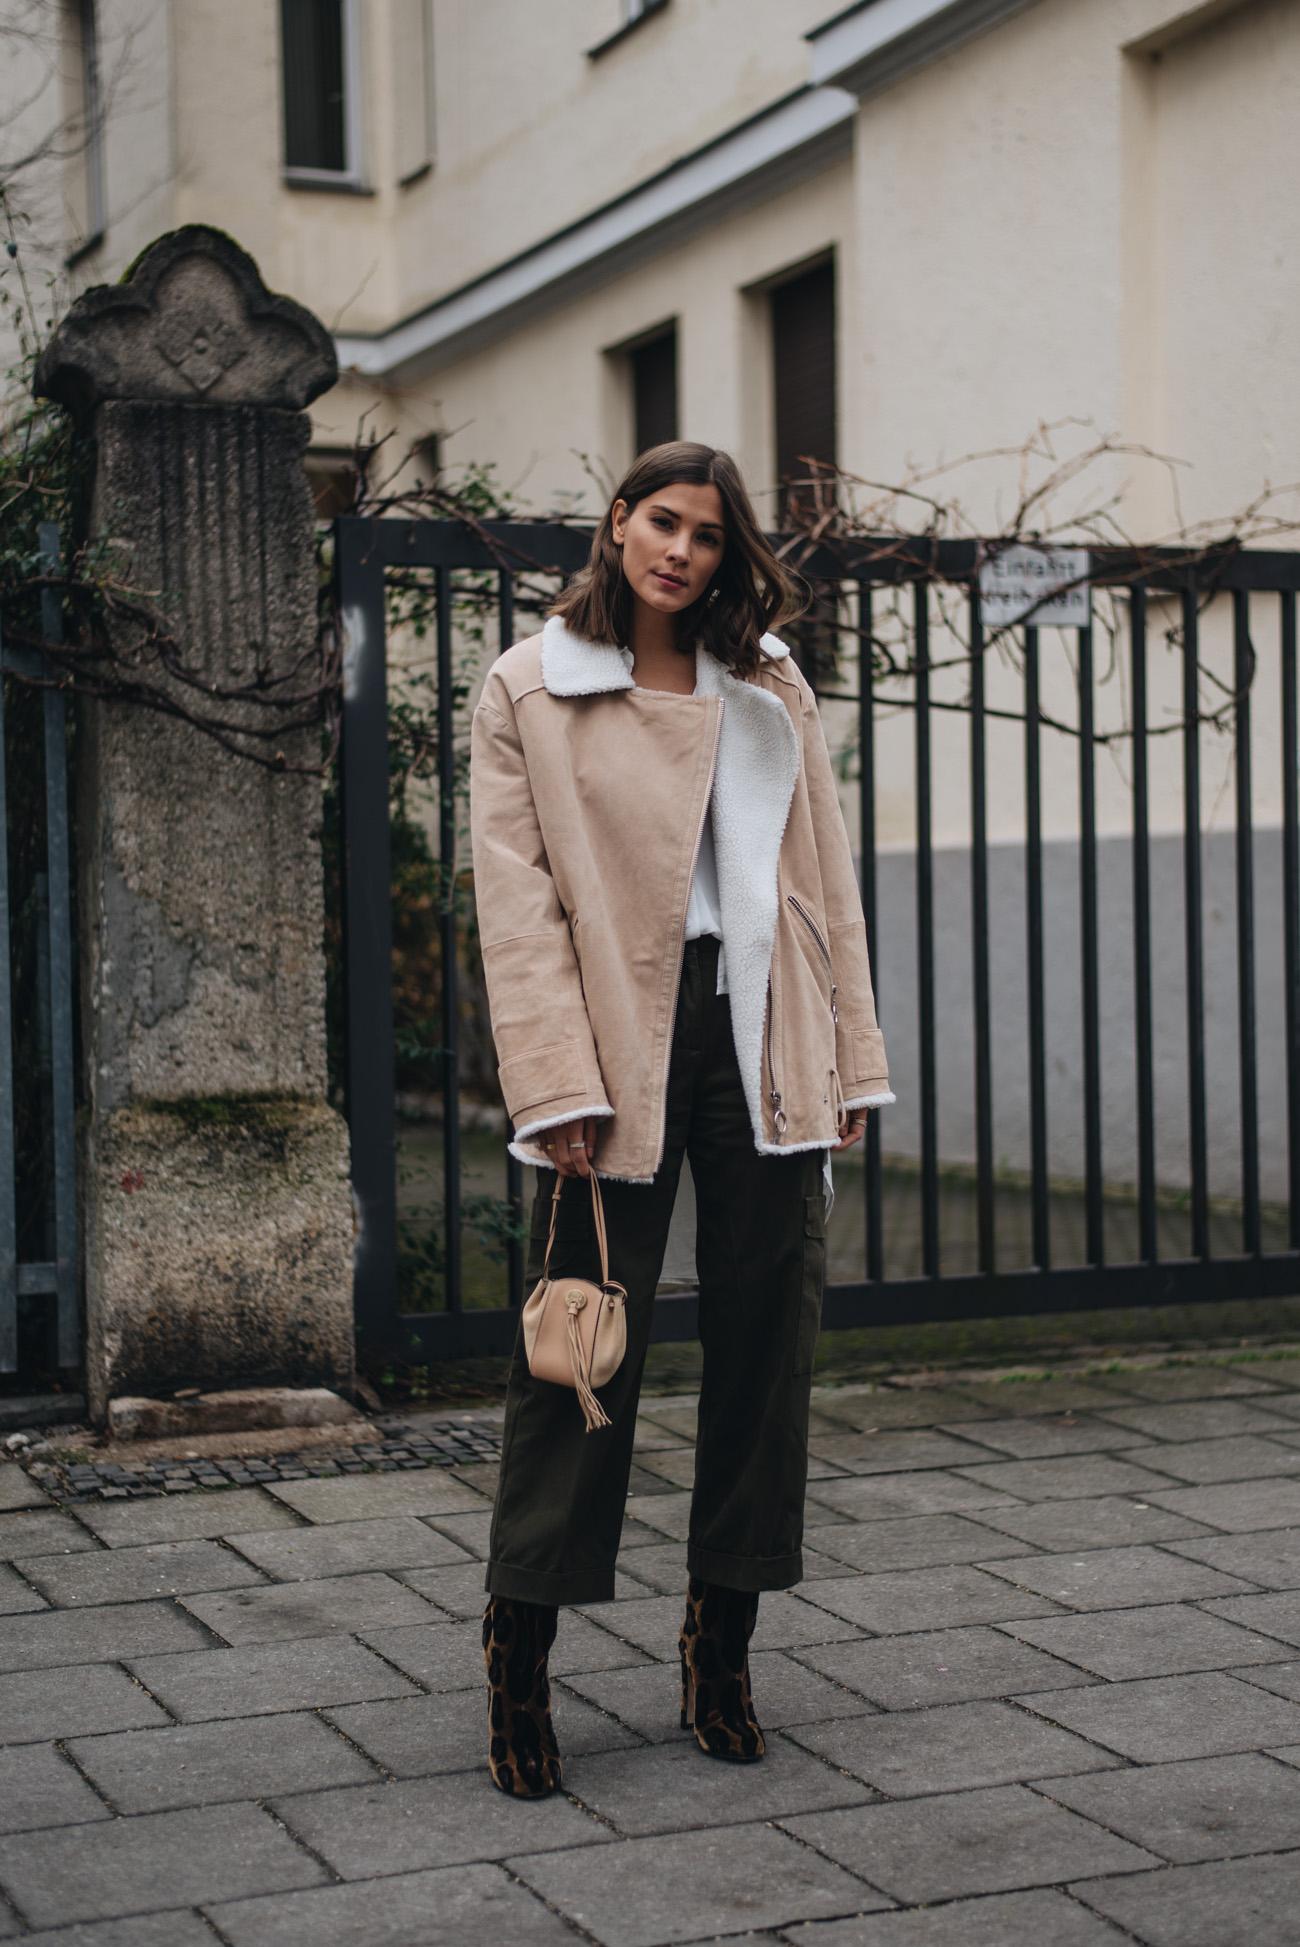 mode-bloggerin-nina-schwichtenberg-mode-trends-herbst-winter-2017-Snwoboard-Outfit-Kleidung-Damen-modisch-stylish-figurbetont-fashiioncarpet